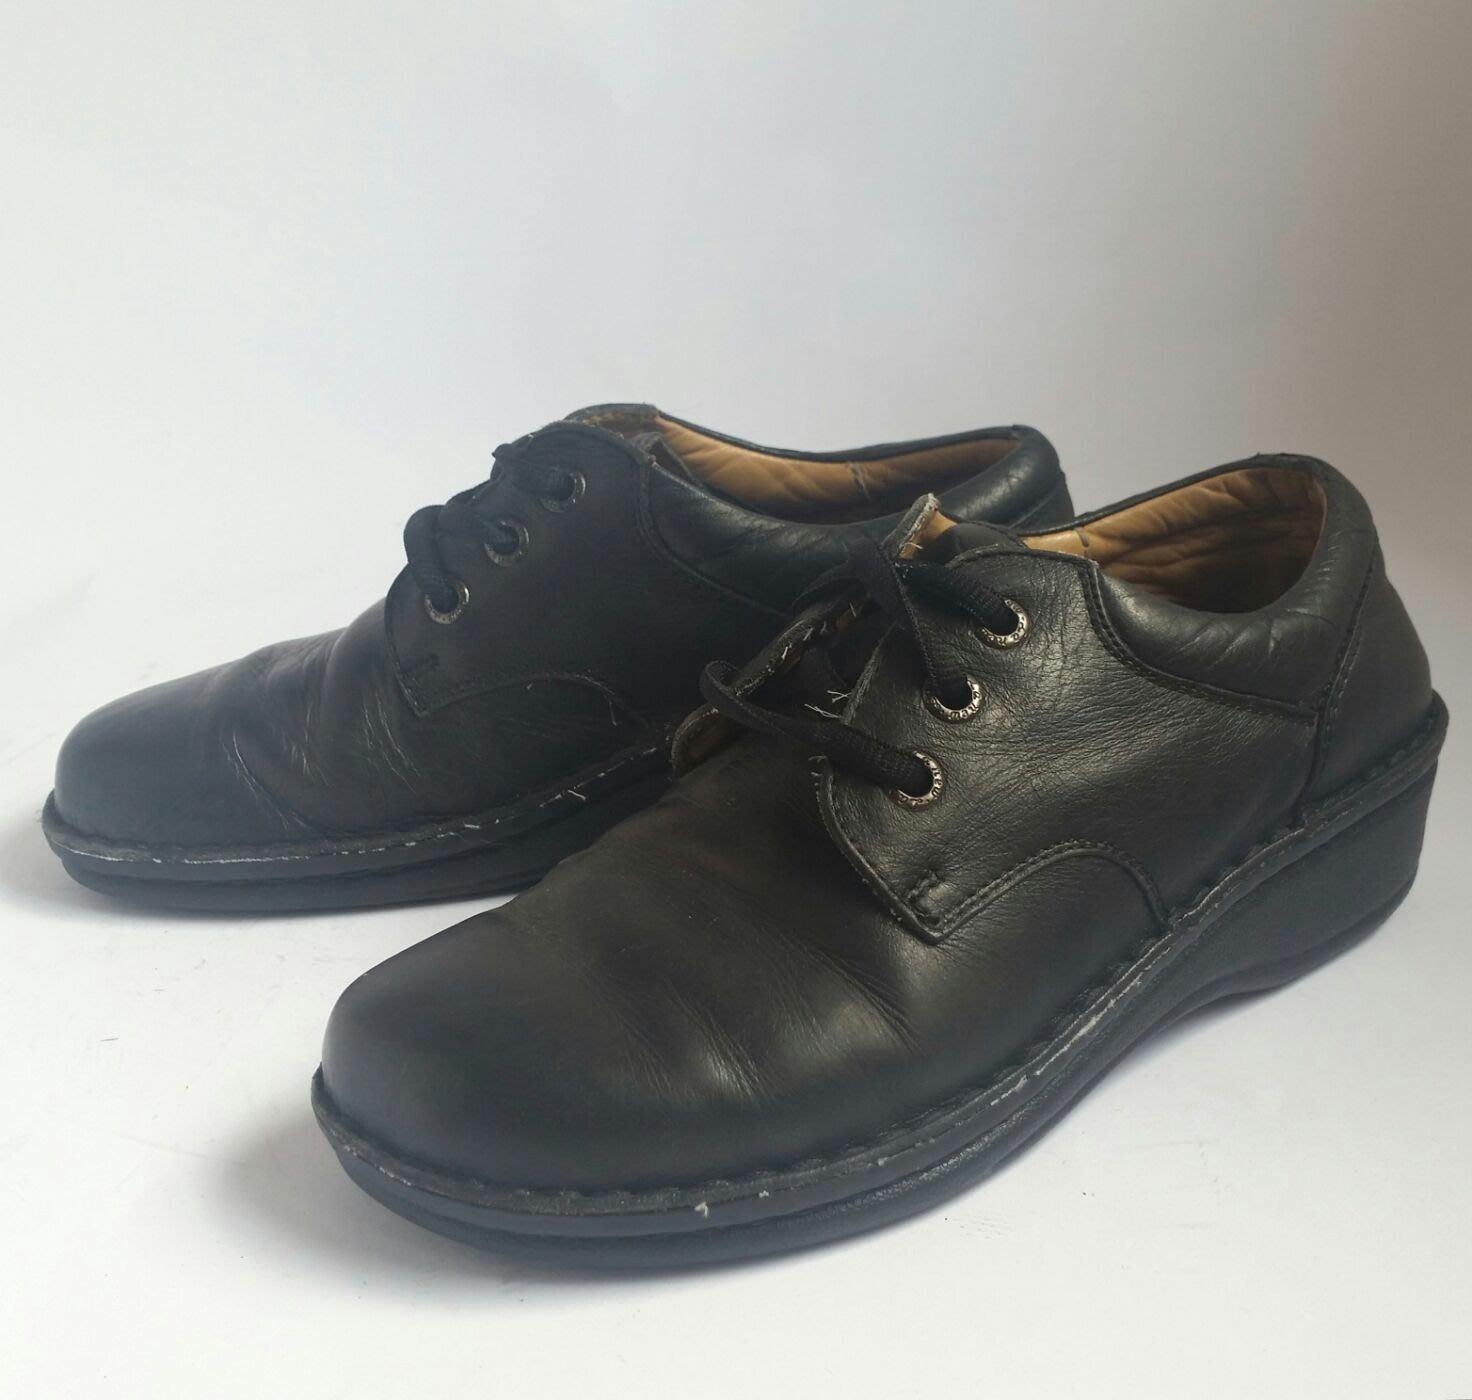 LU NEW 真皮黑色休閒皮鞋 22號小碼 B09